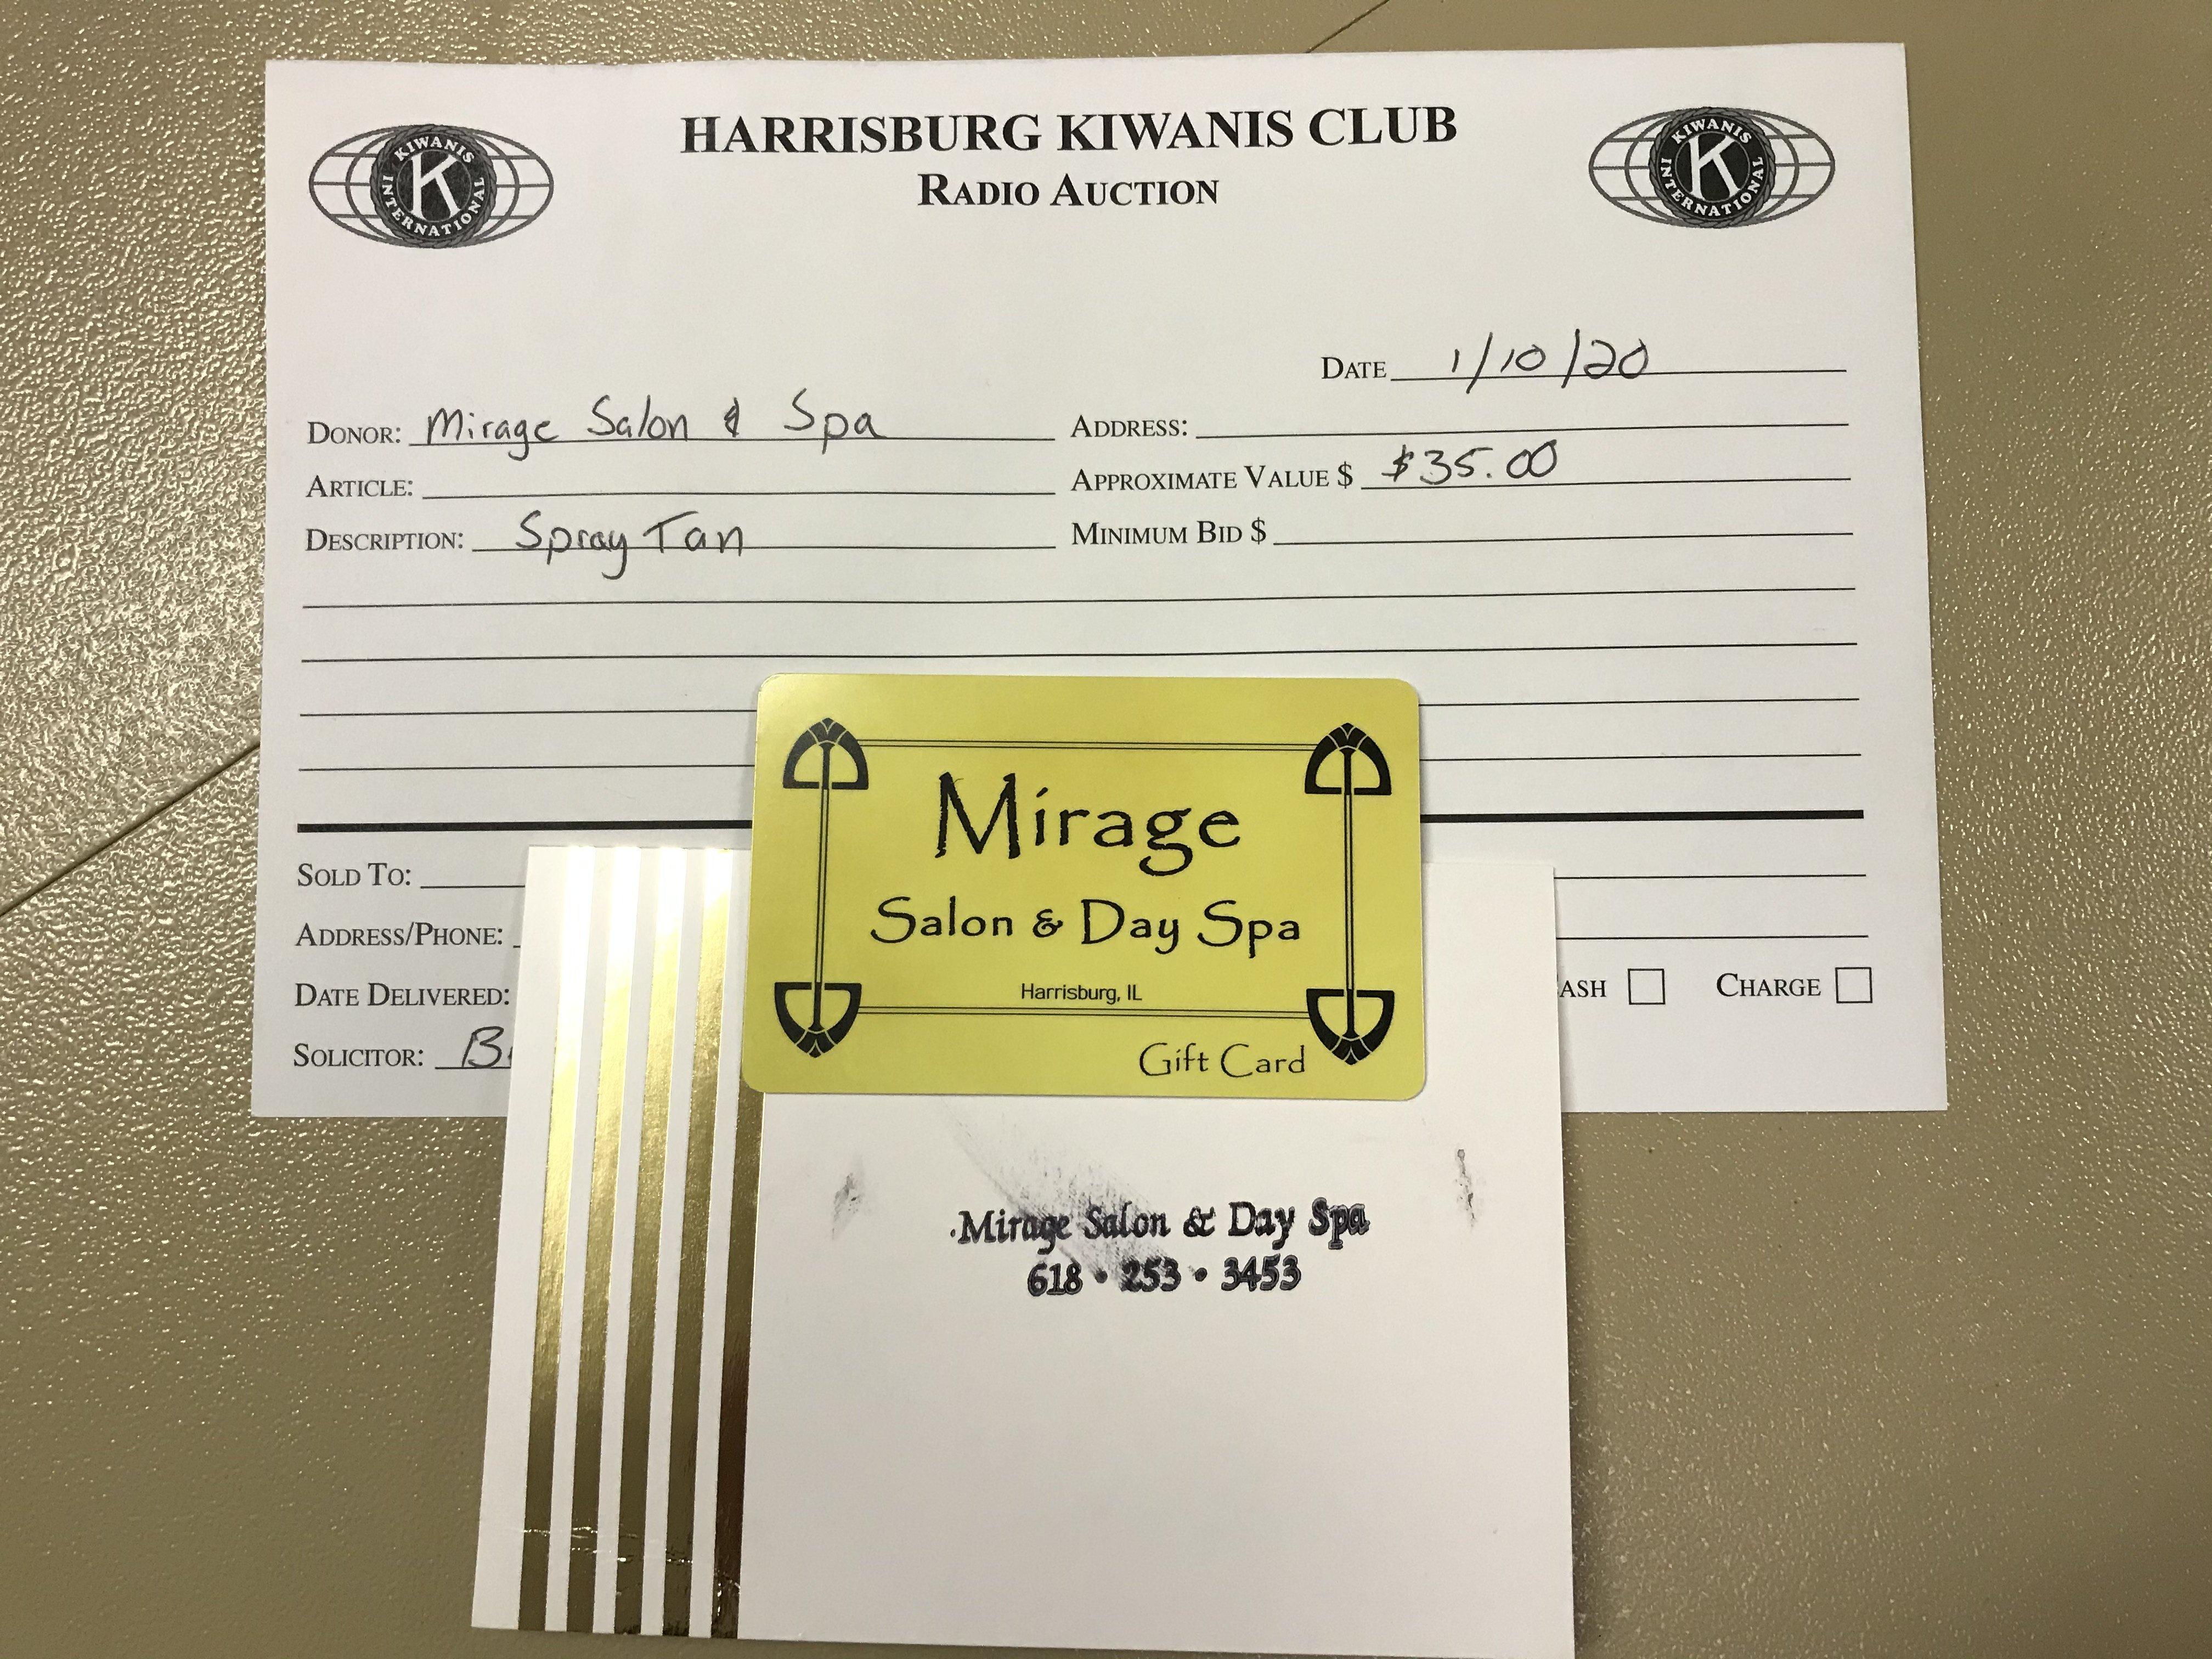 Item 222 - Mirage Salon & Day Spa 1 Free Spray Tan